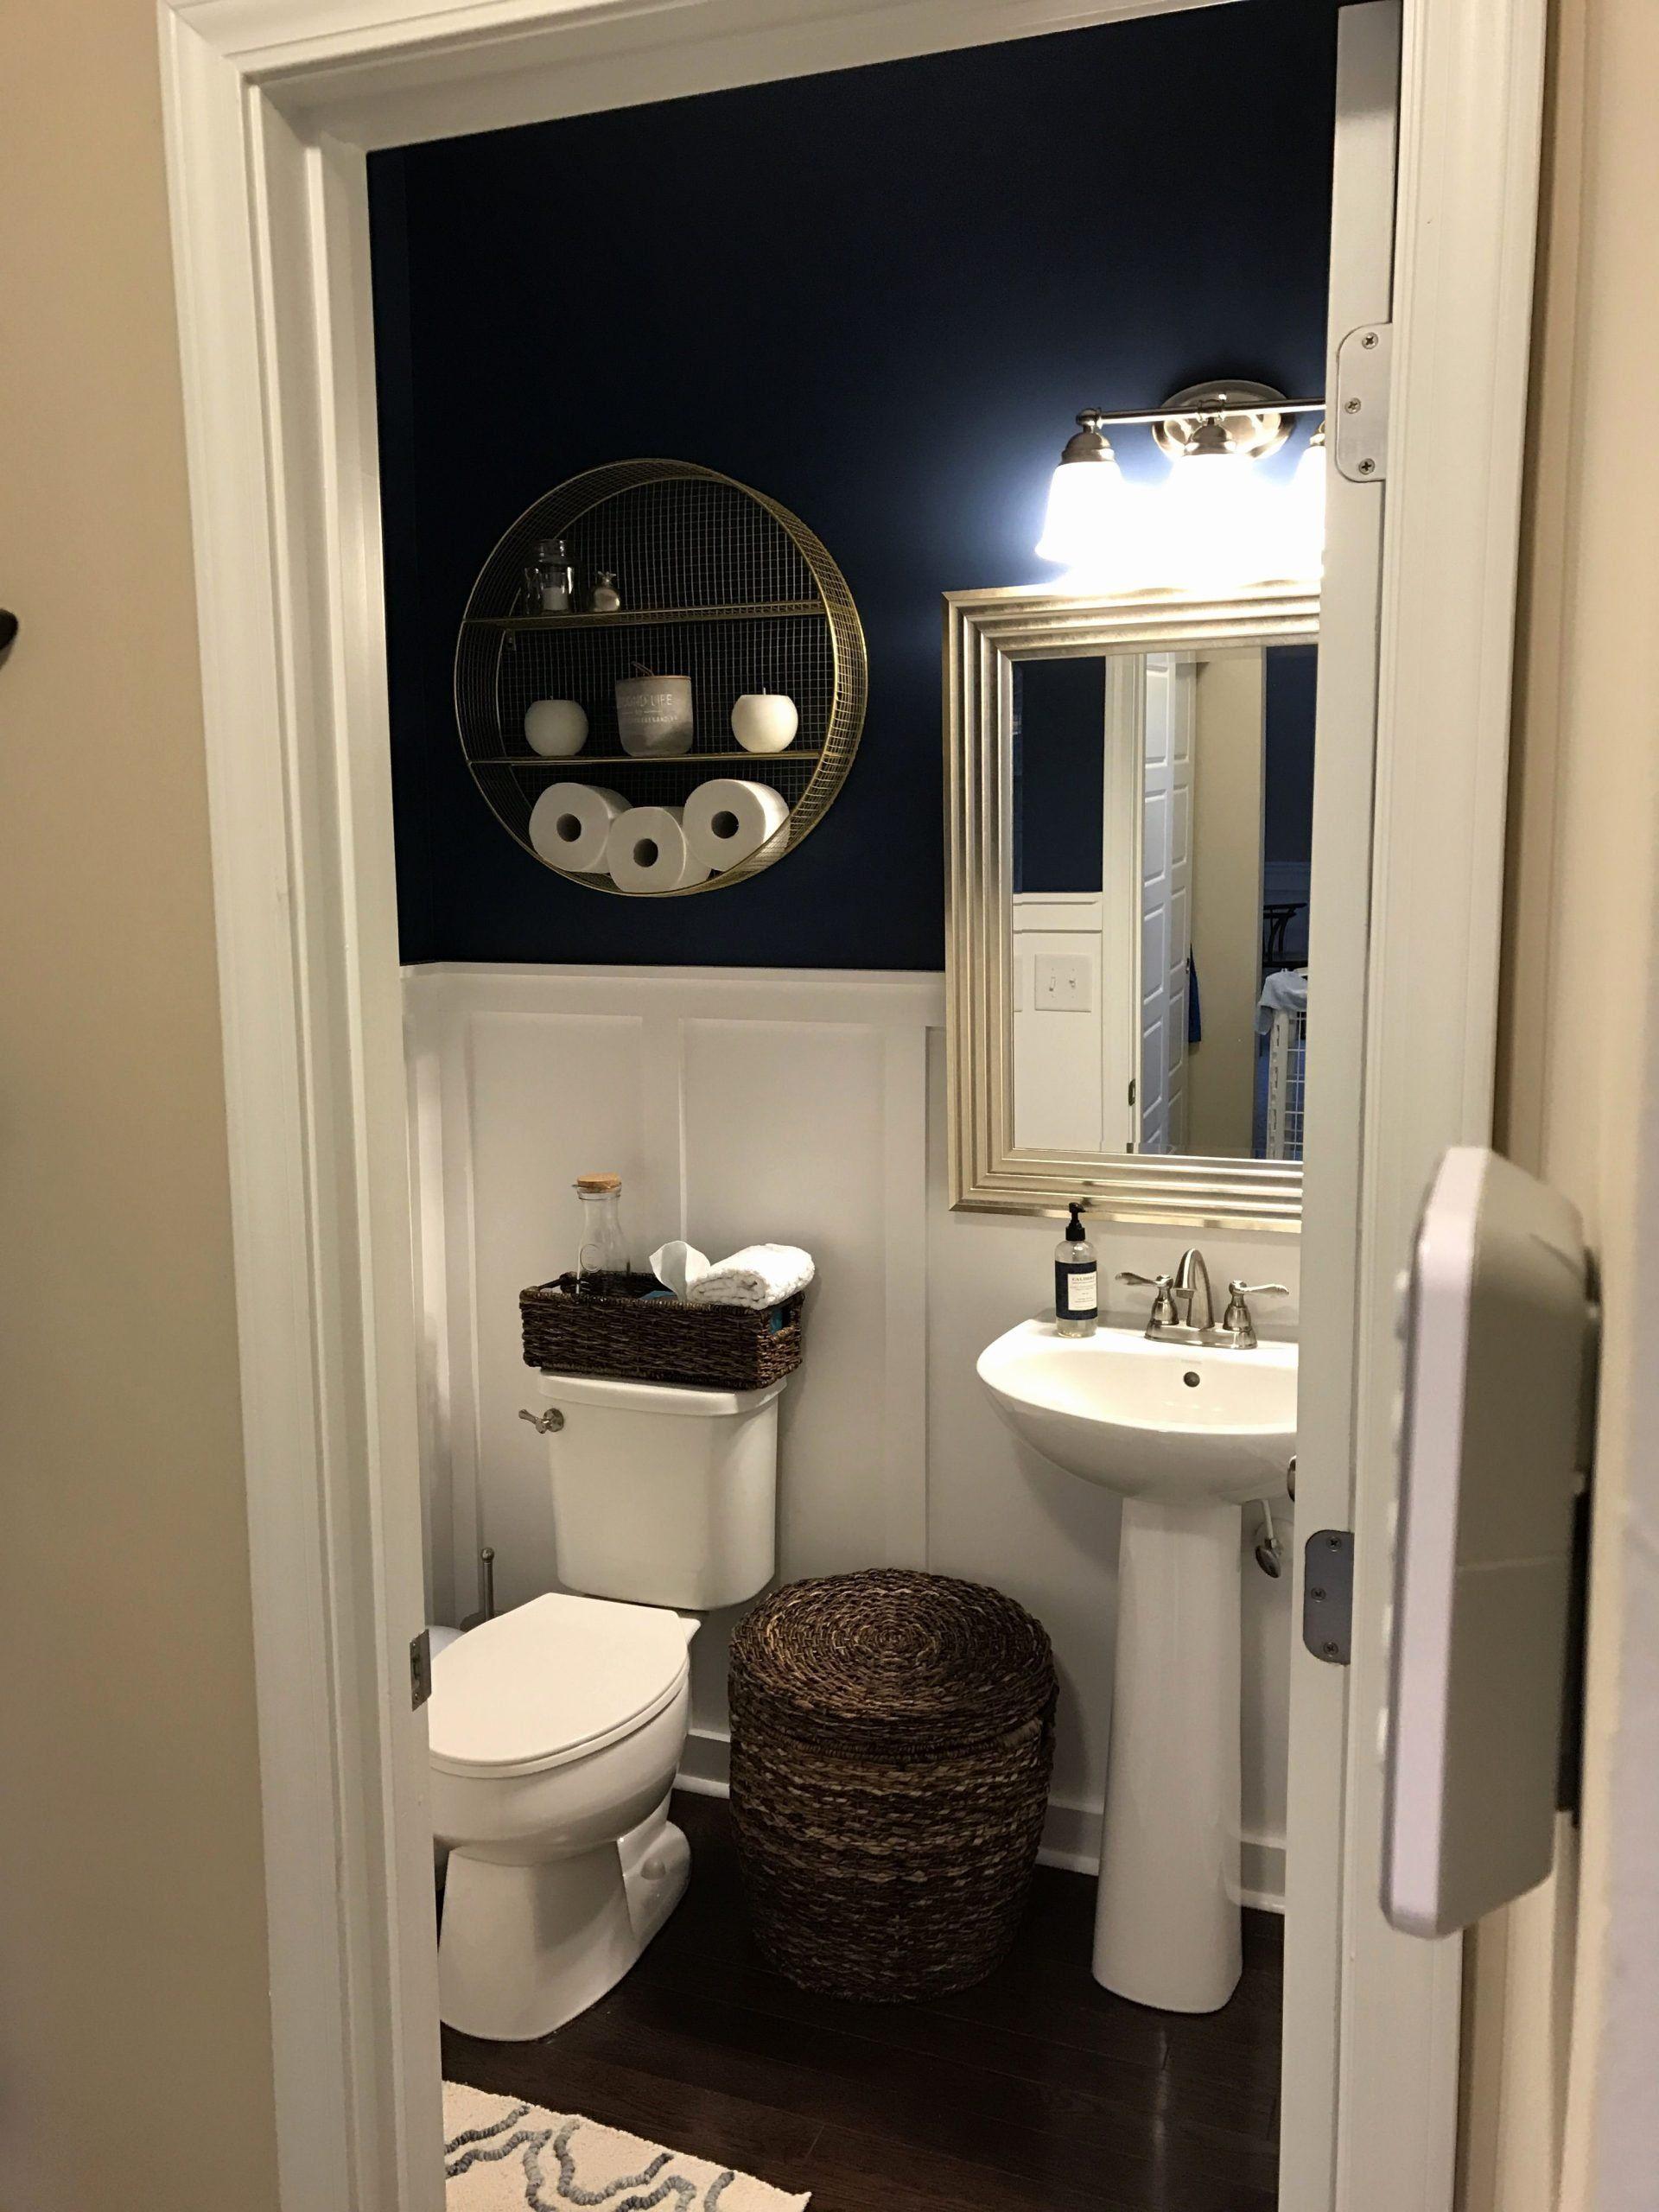 Pin On Decor Ideas Half bathroom design ideas